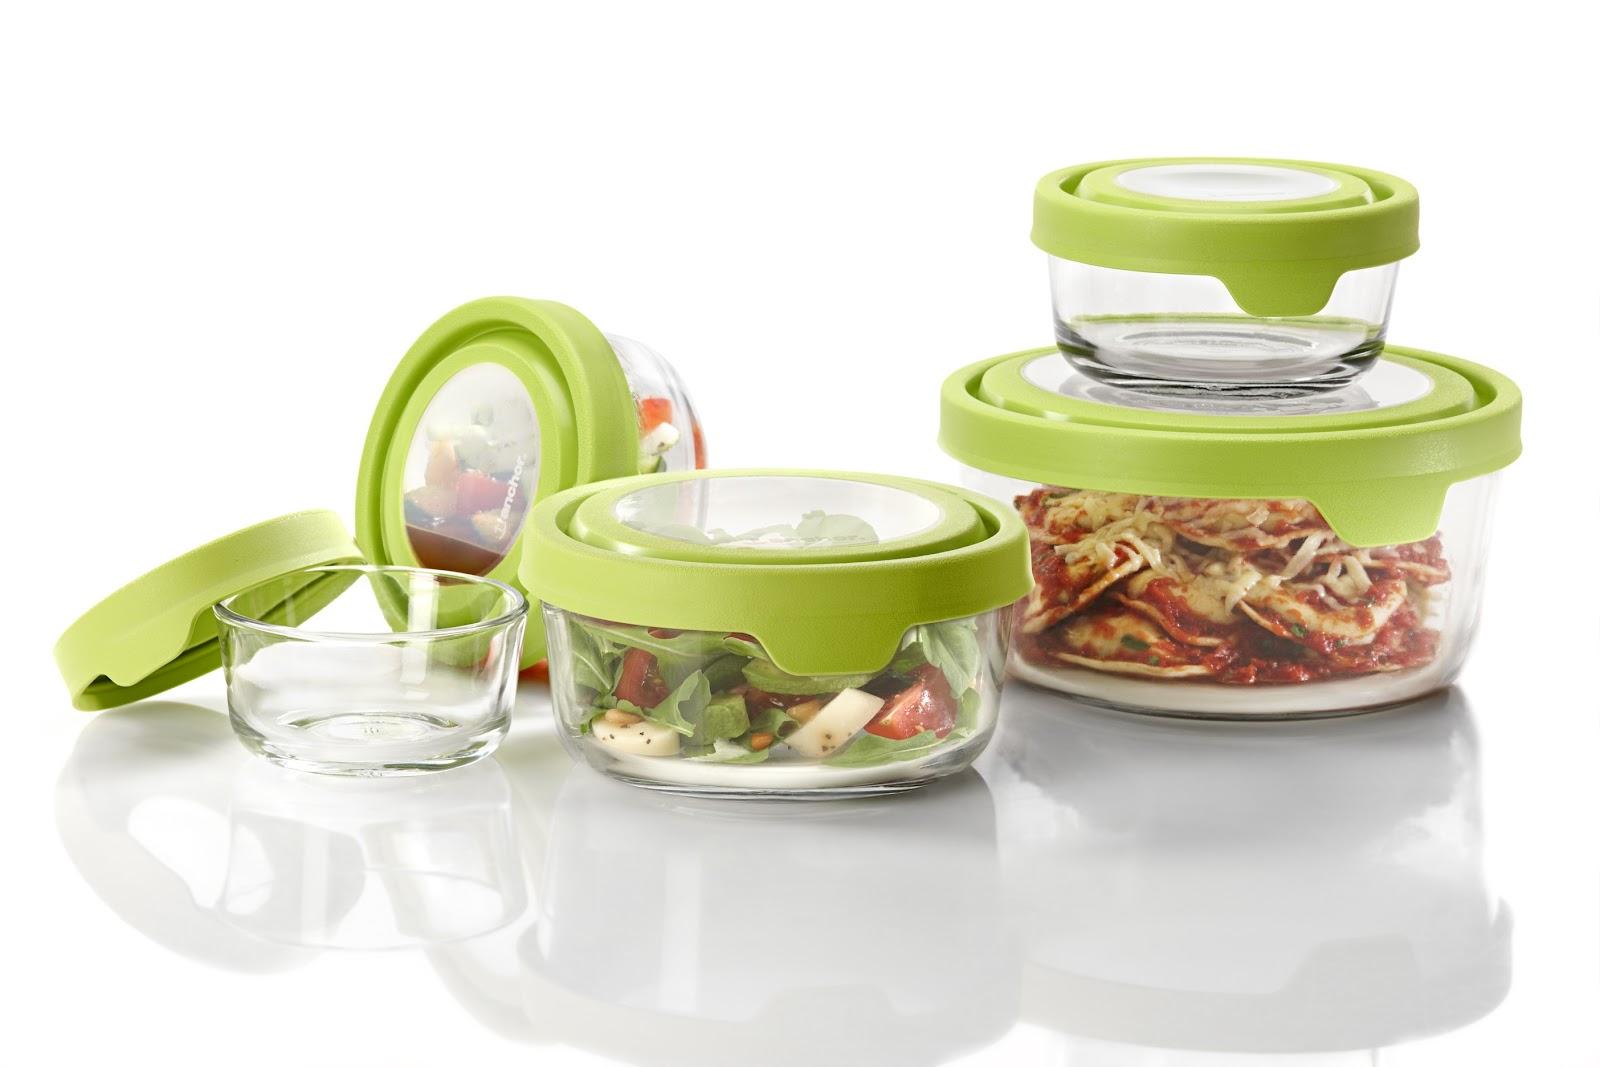 Cocina segura septiembre 2012 - Recipientes para alimentos ...